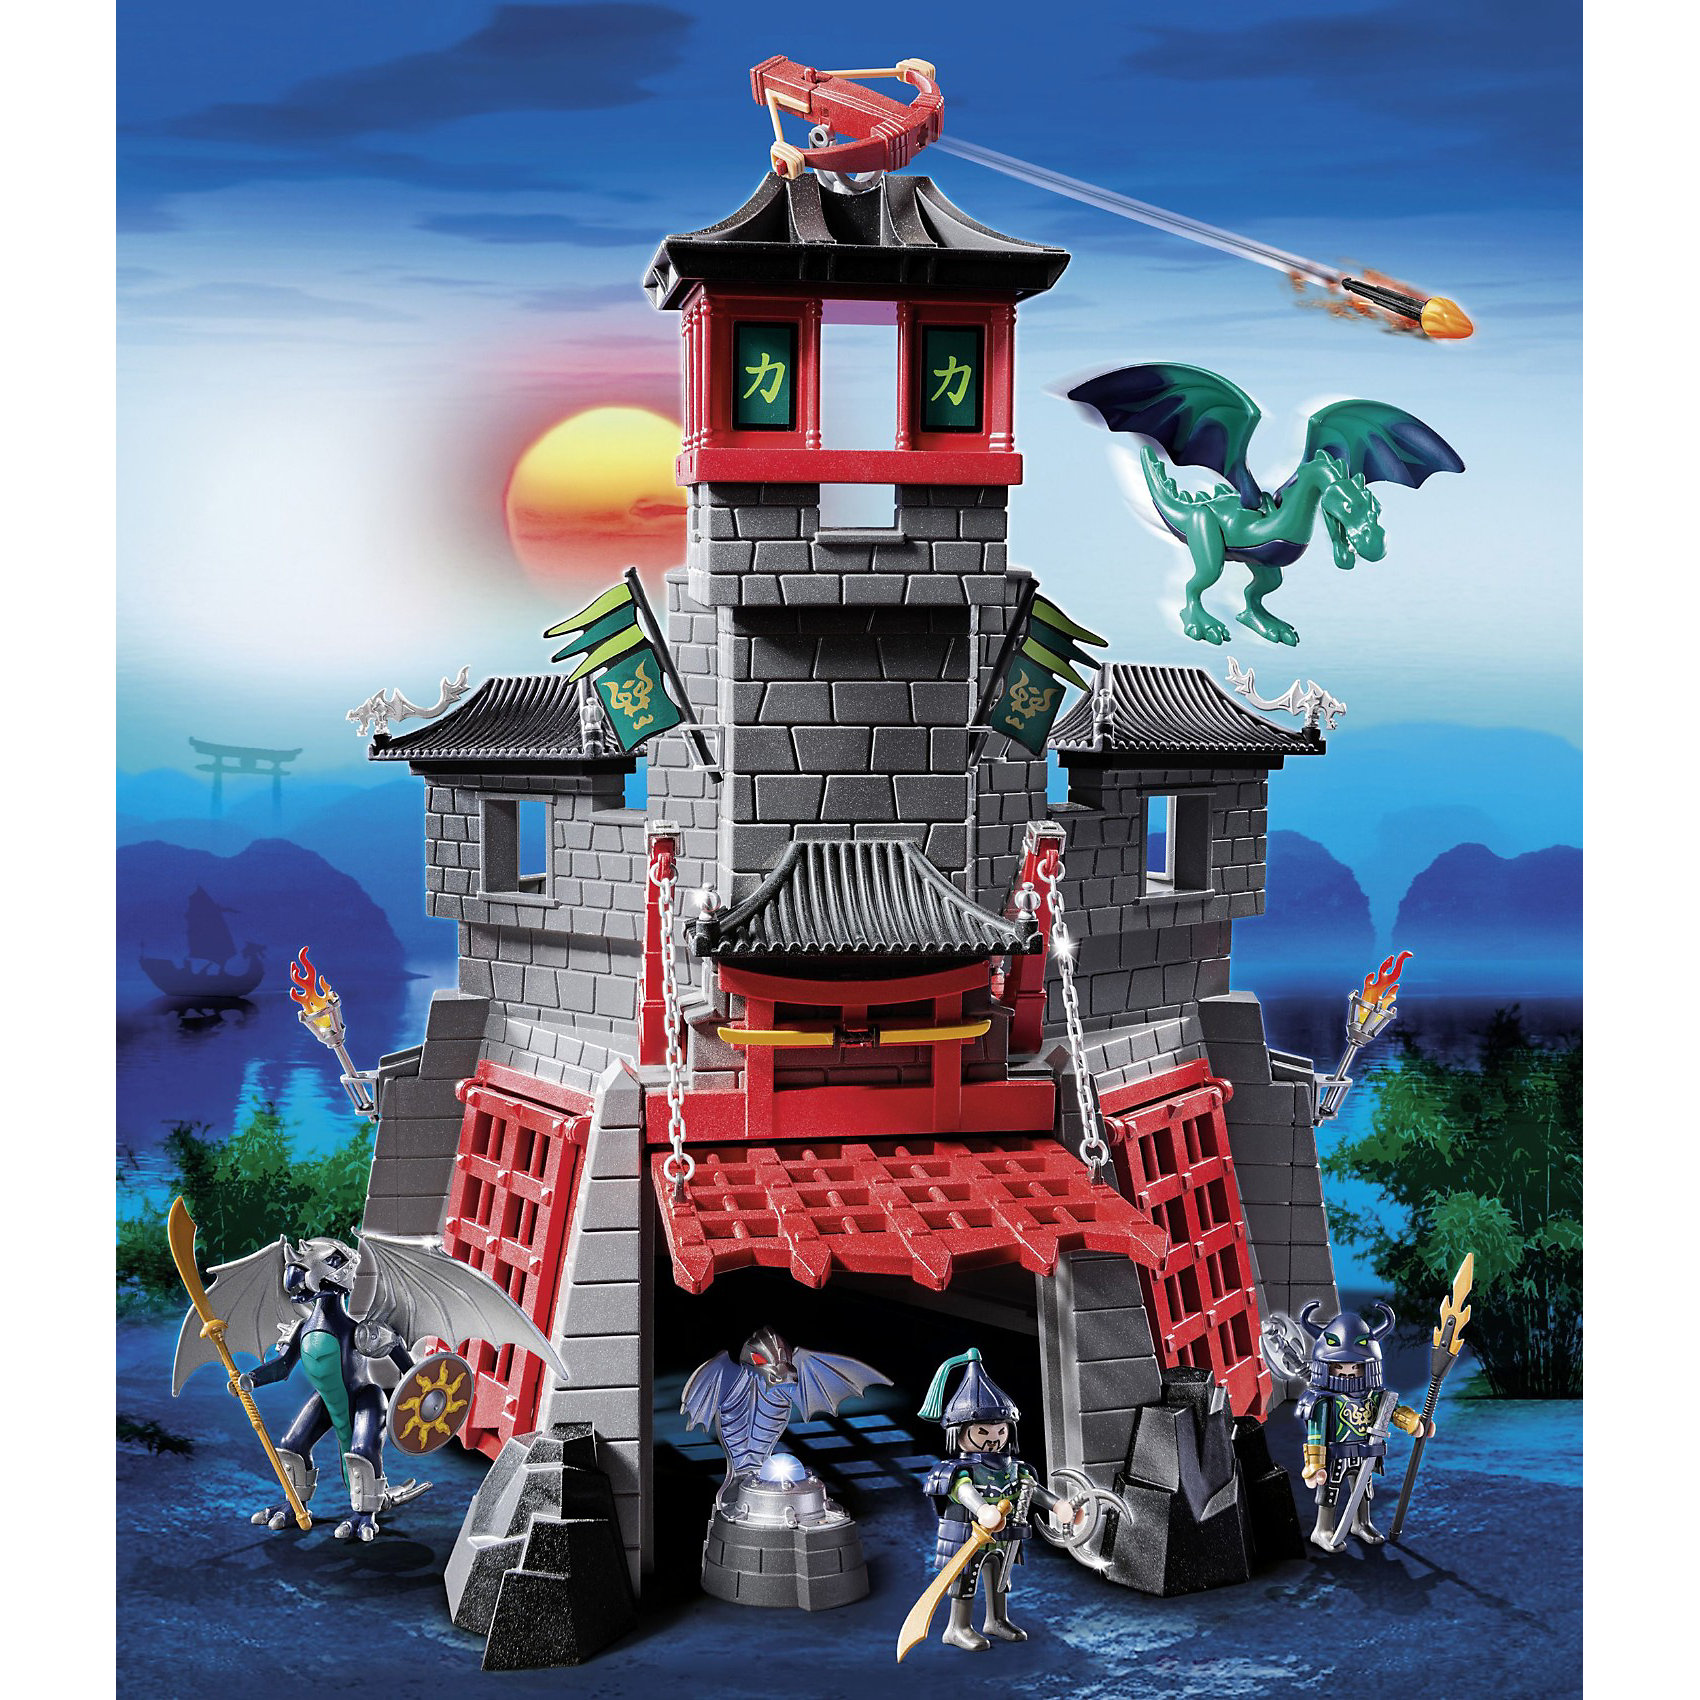 PLAYMOBIL® Секретный форт Дракона, PLAYMOBIL форт ромашки 900x600 серый